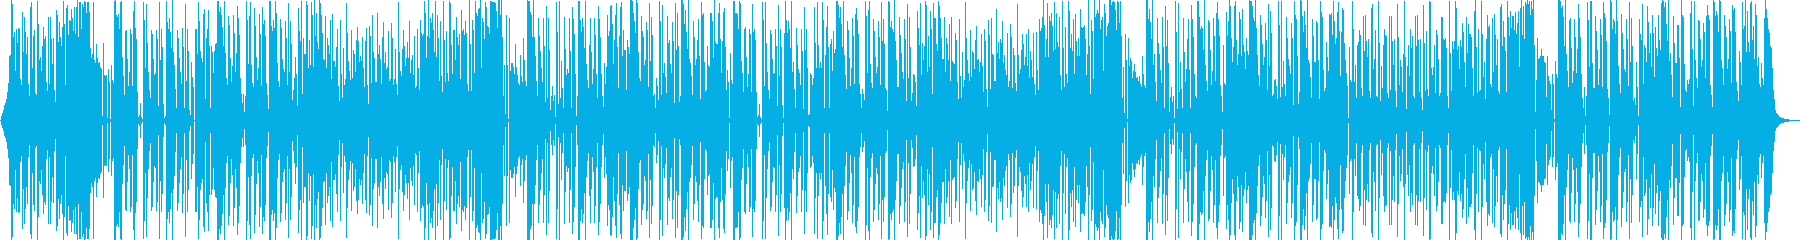 Kpop・エキサイティングブラストラップの再生済みの波形